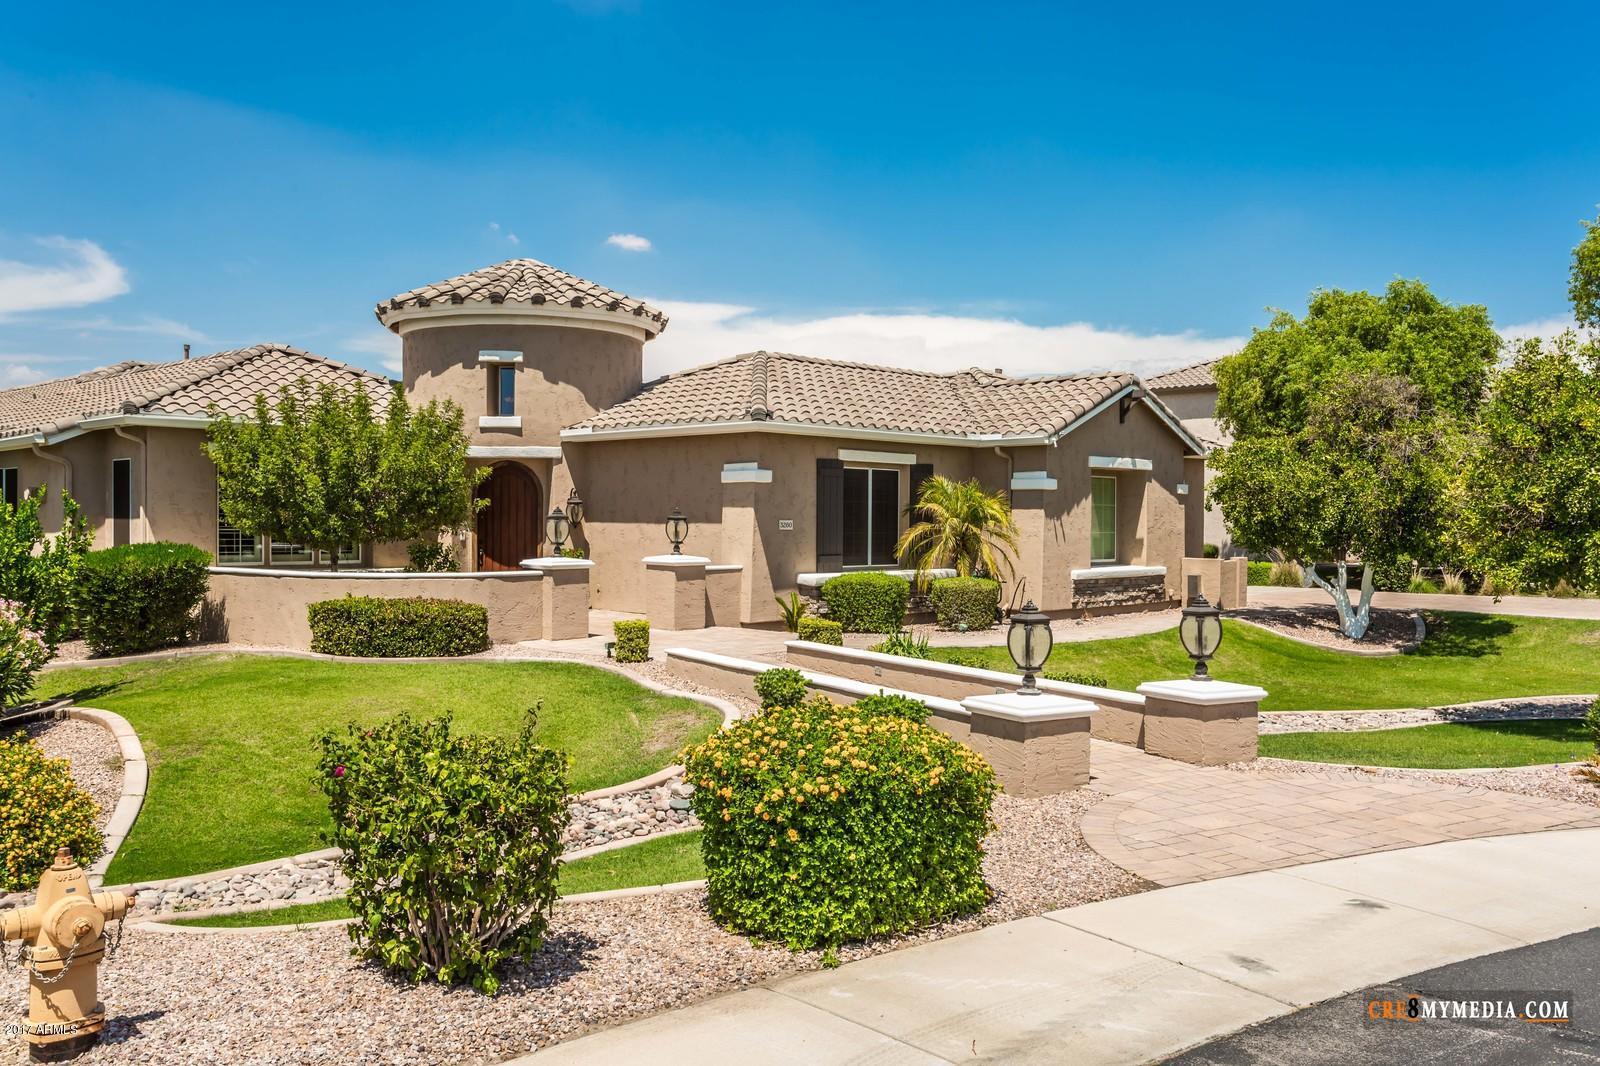 MLS 5574801 3260 E VALLEJO Court, Gilbert, AZ 85298 Golf Homes